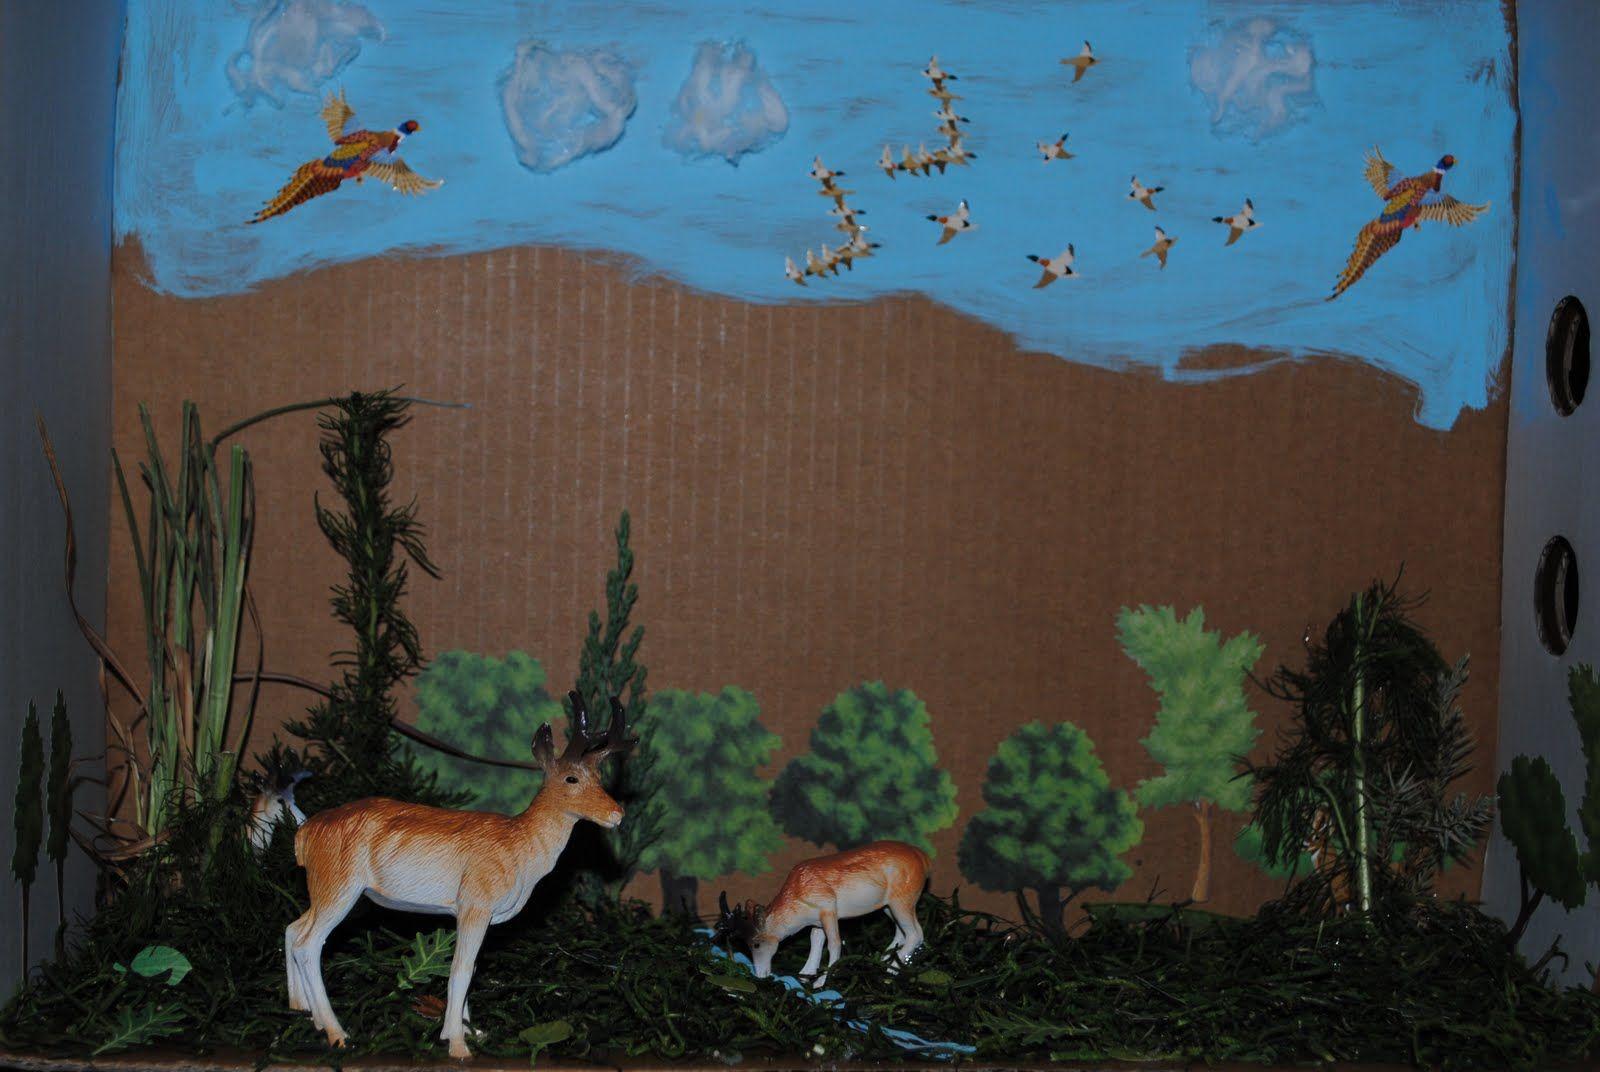 Animals habitats on pinterest 106 pins for Habitat container